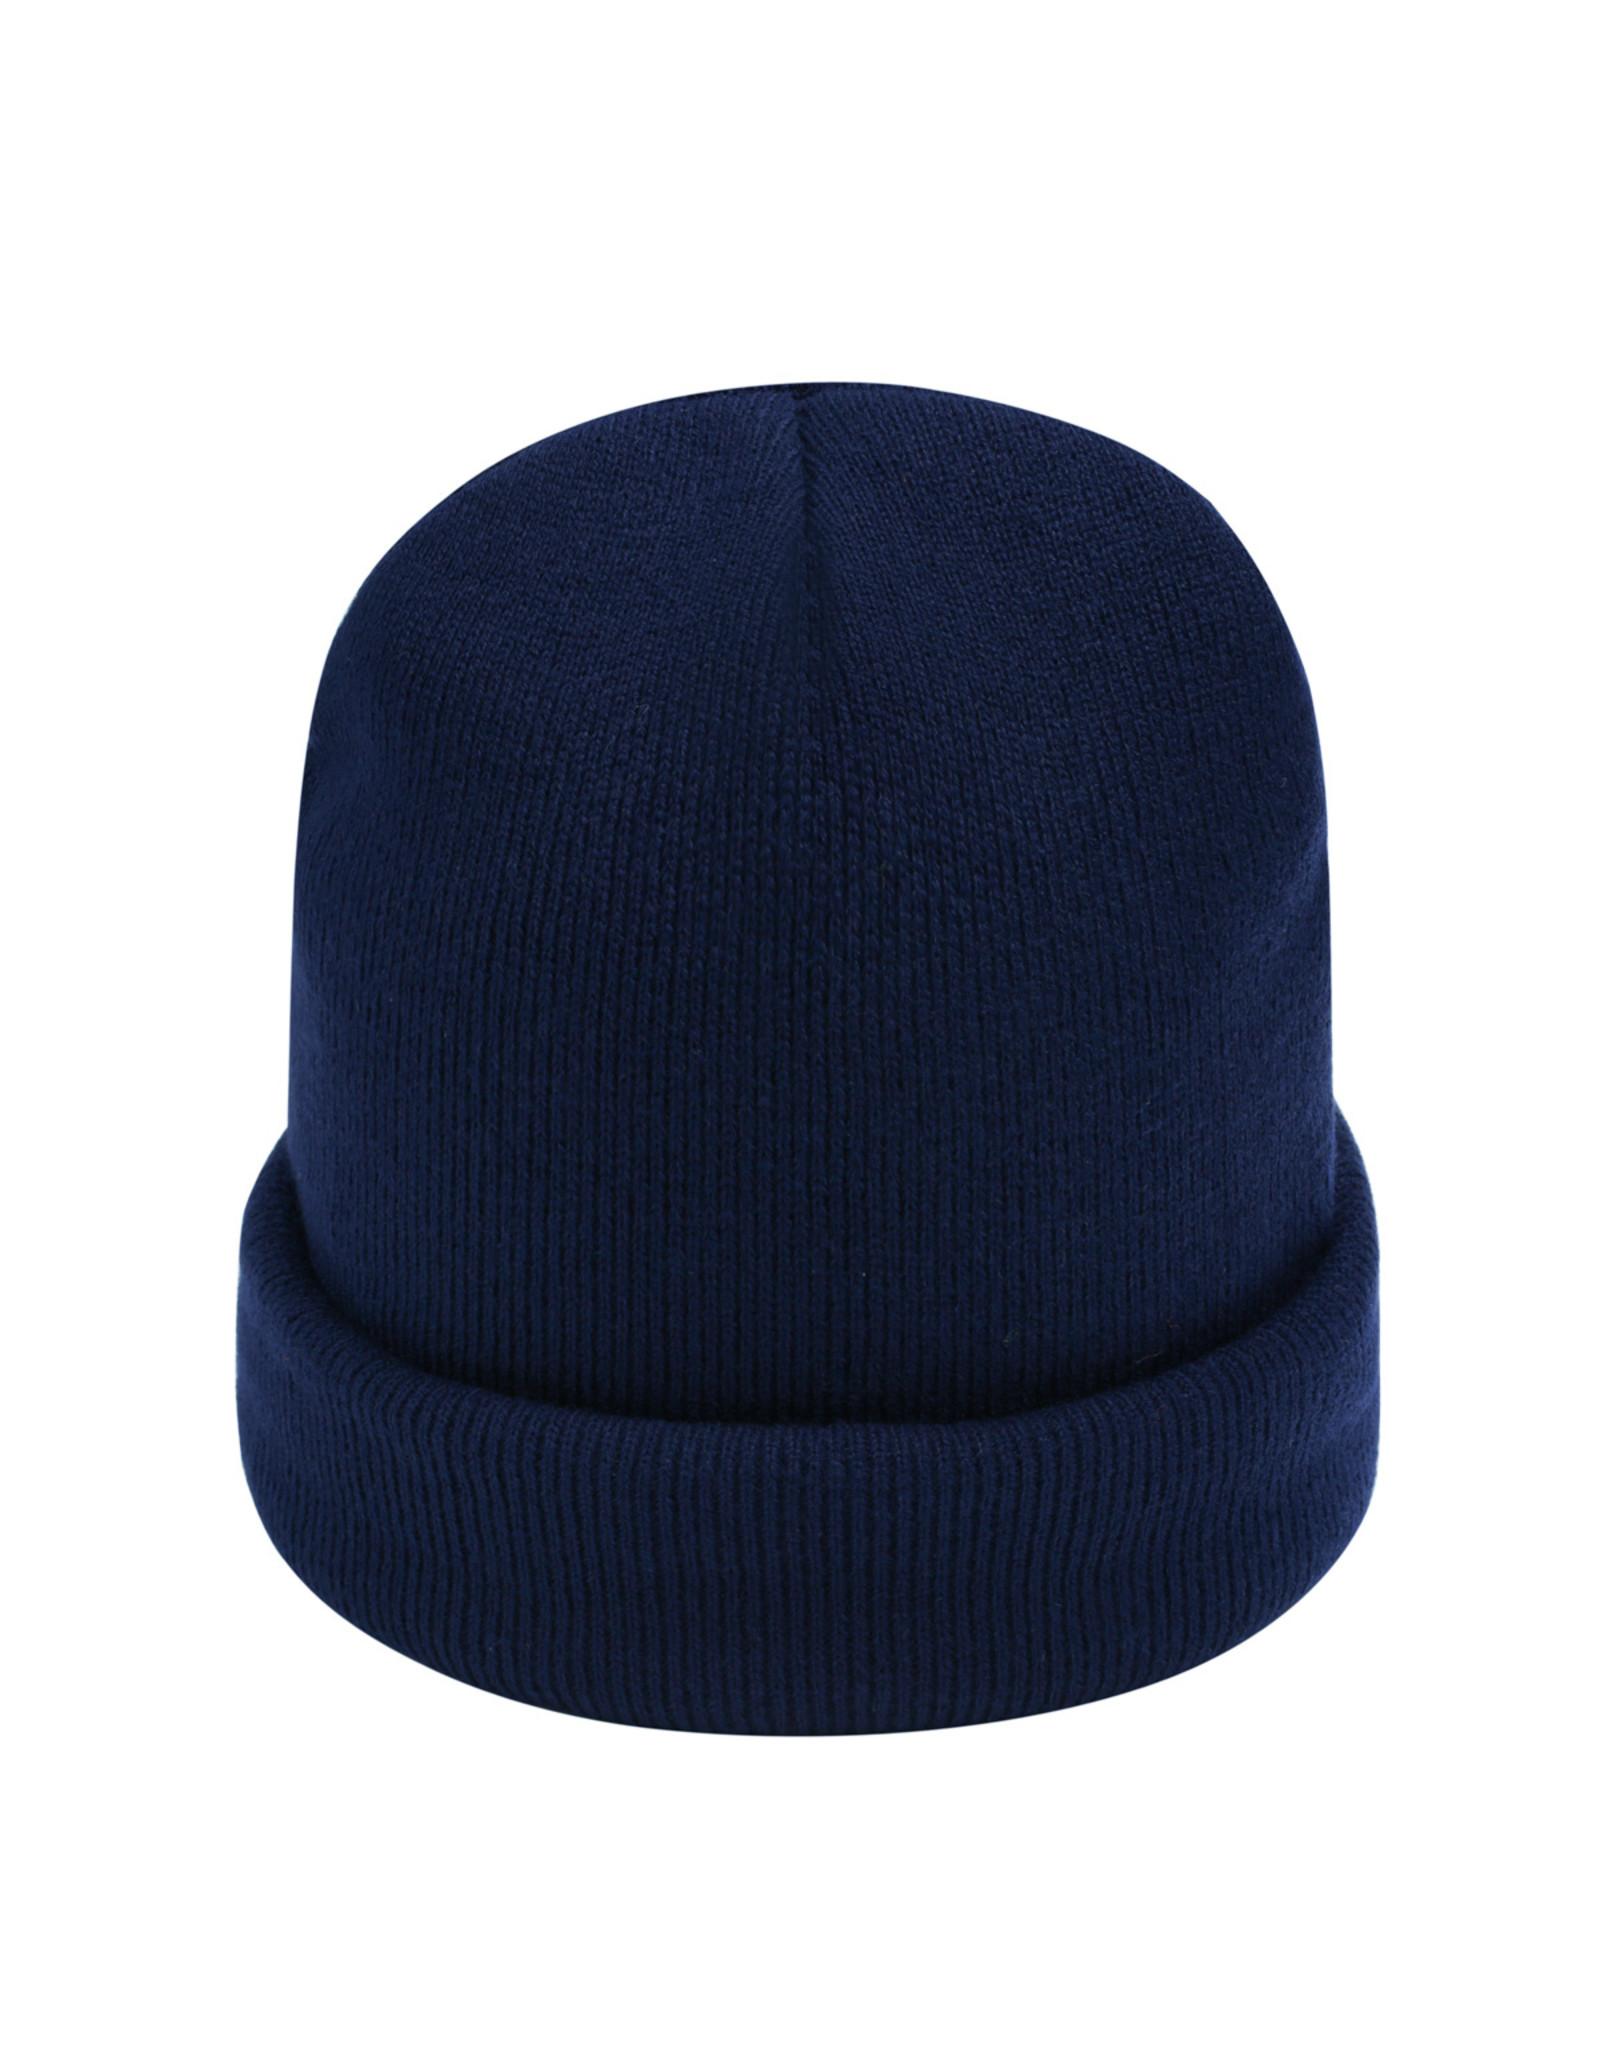 BEANIE NAVY BLUE